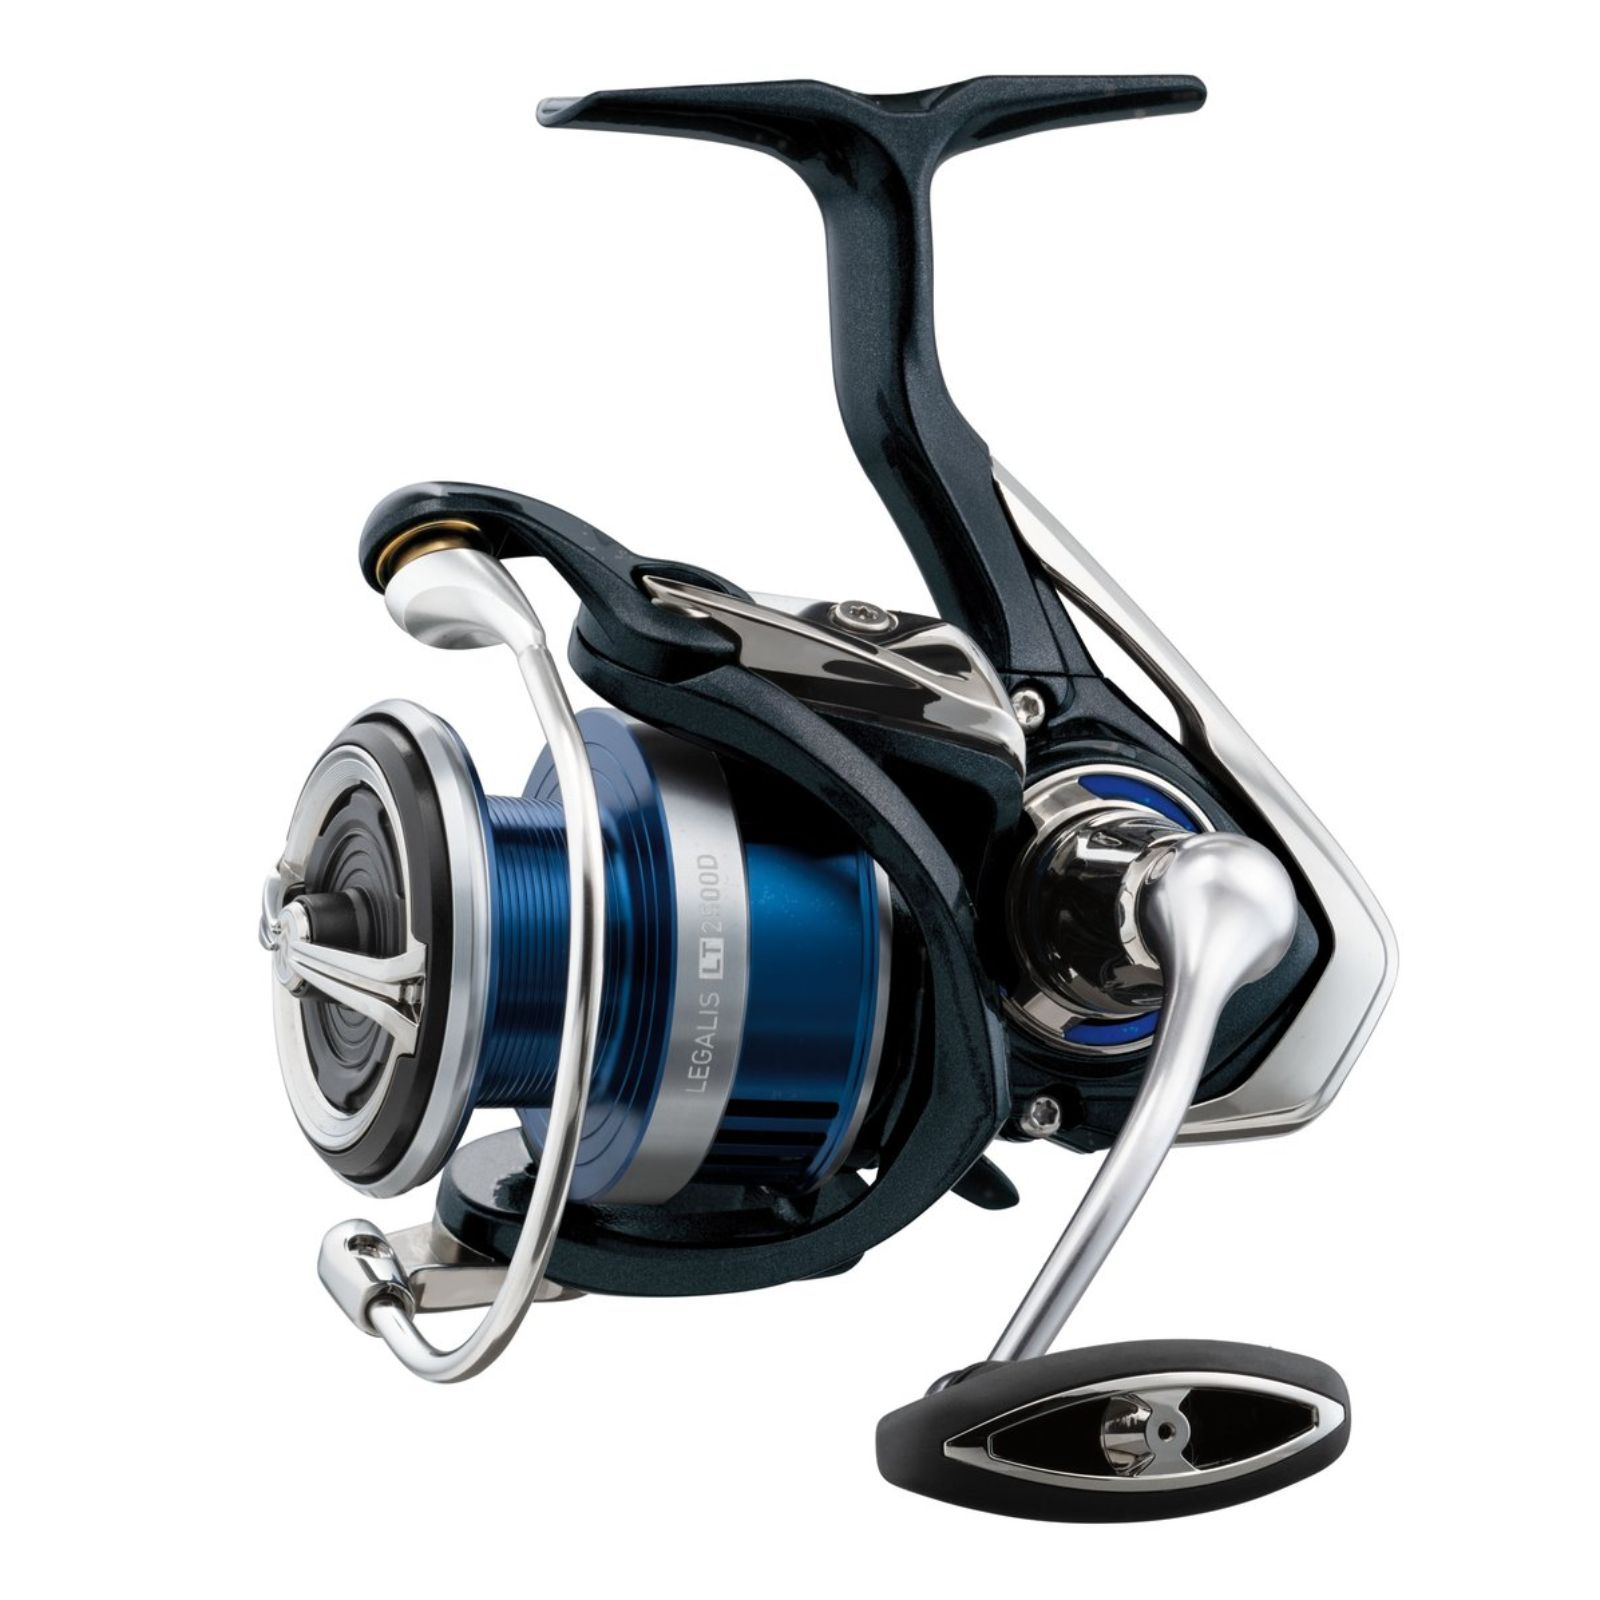 Daiwa Legalis LT 6000D Spinning Reel